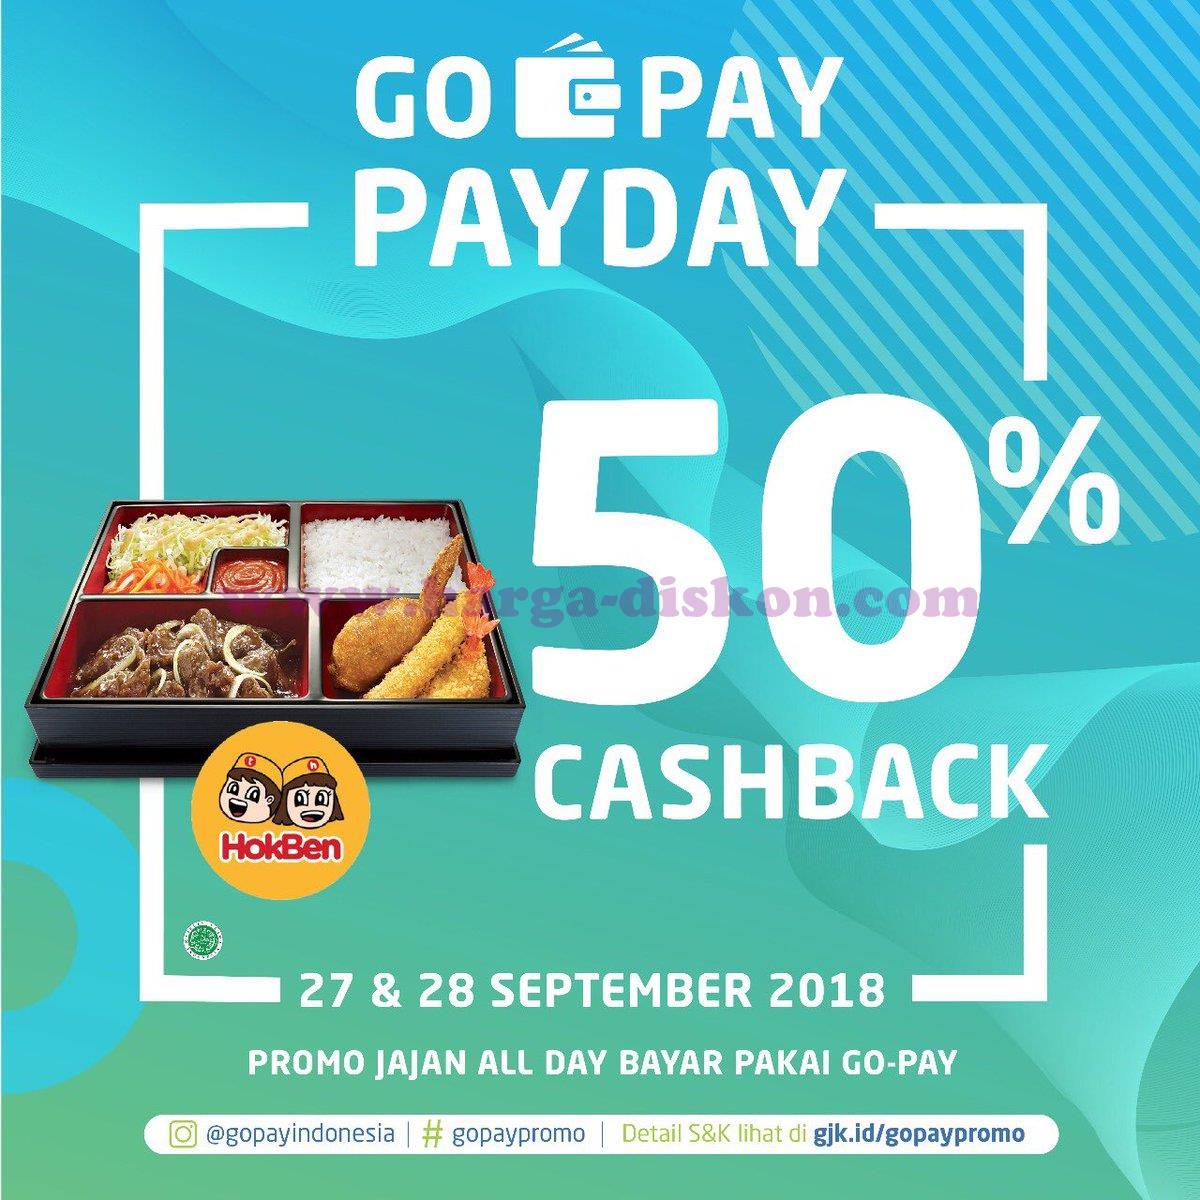 Promo Hokben Terbaru Cashback 50 Dengan Gopay Periode 27 28 September 2018 Harga Diskon